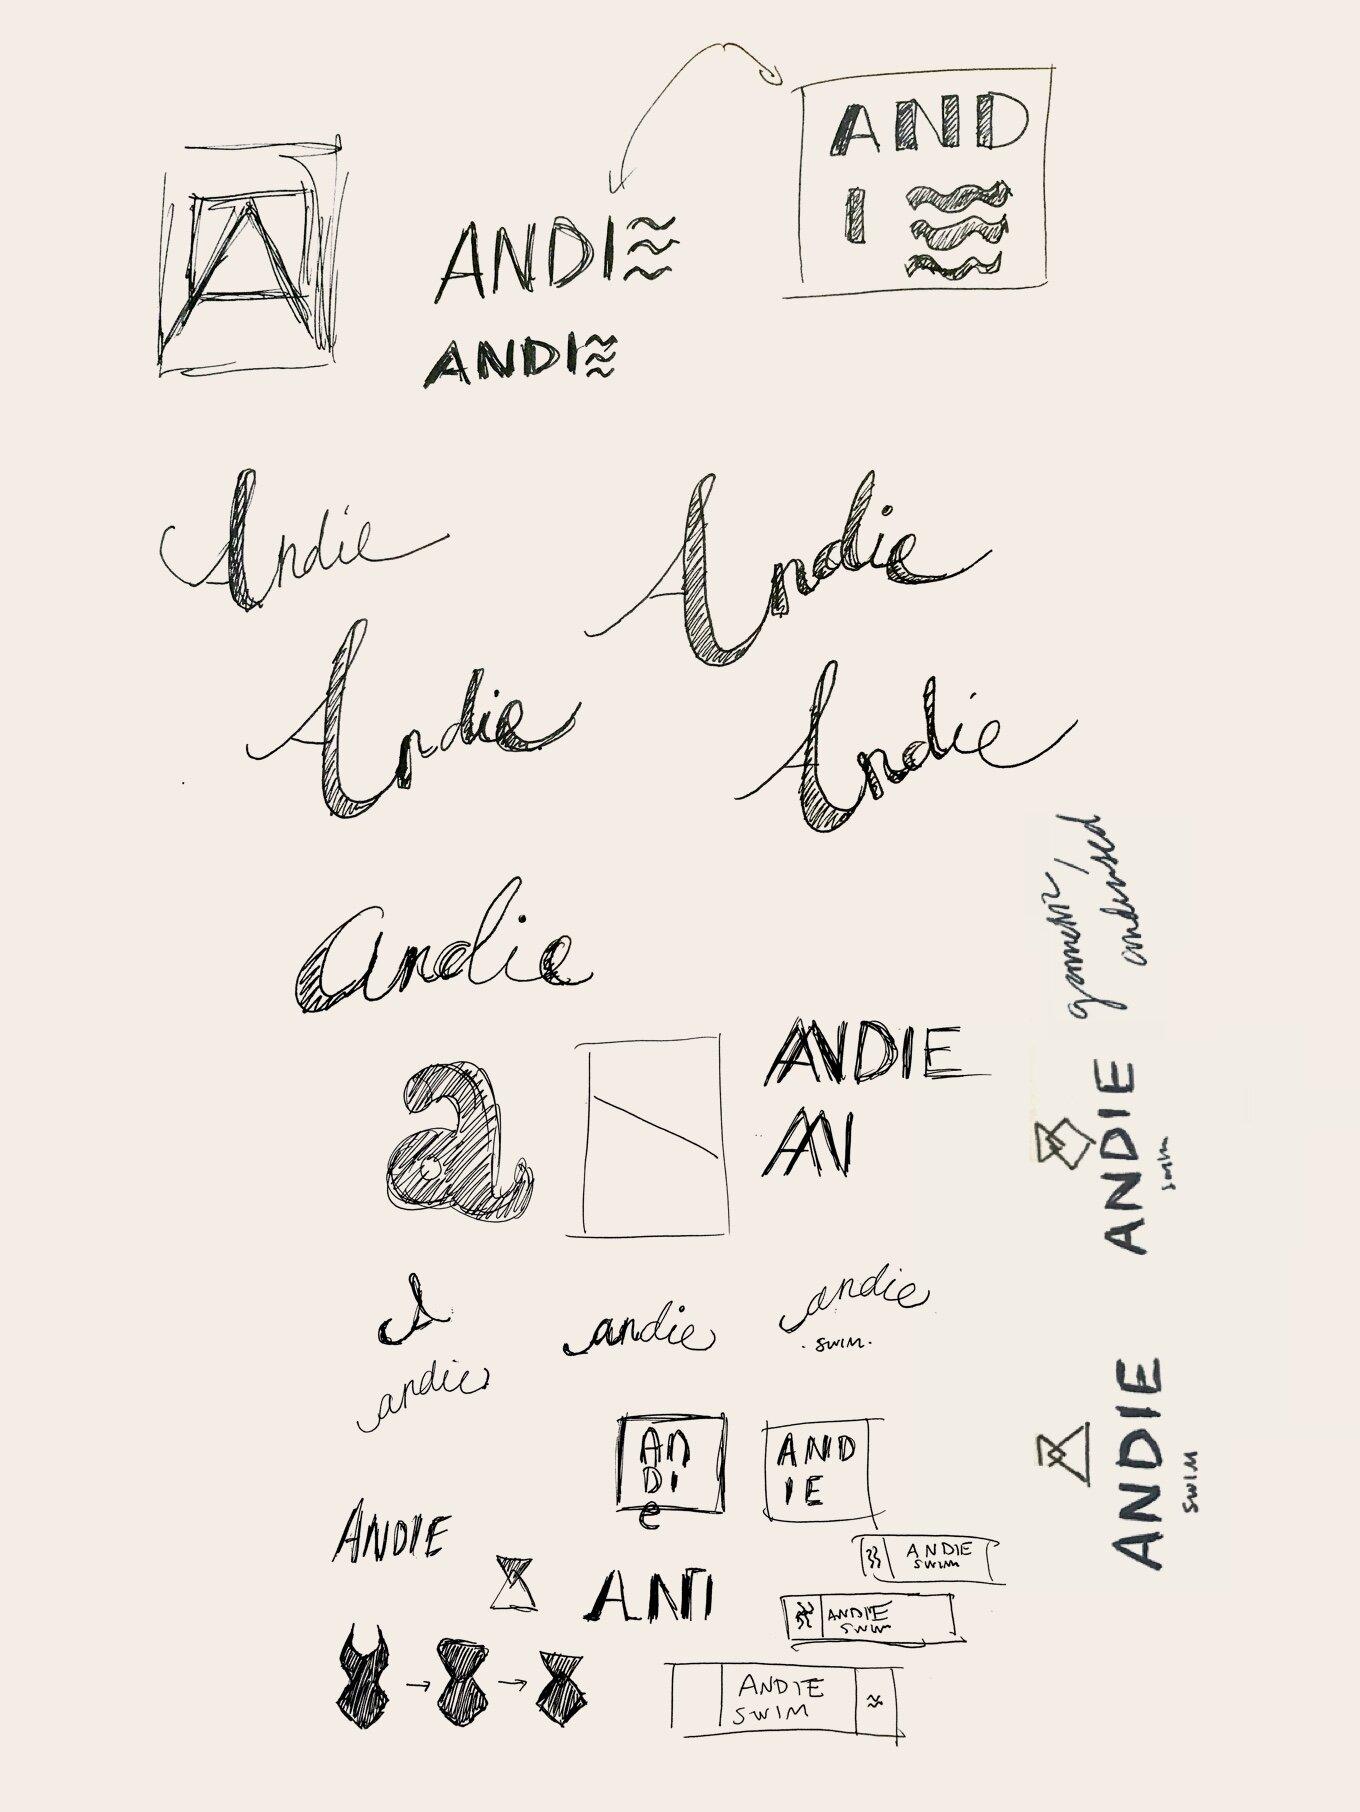 aptdeco-hearst-hearstlabs-decor-wildes-district-new-york-design-web-agency-03.jpg